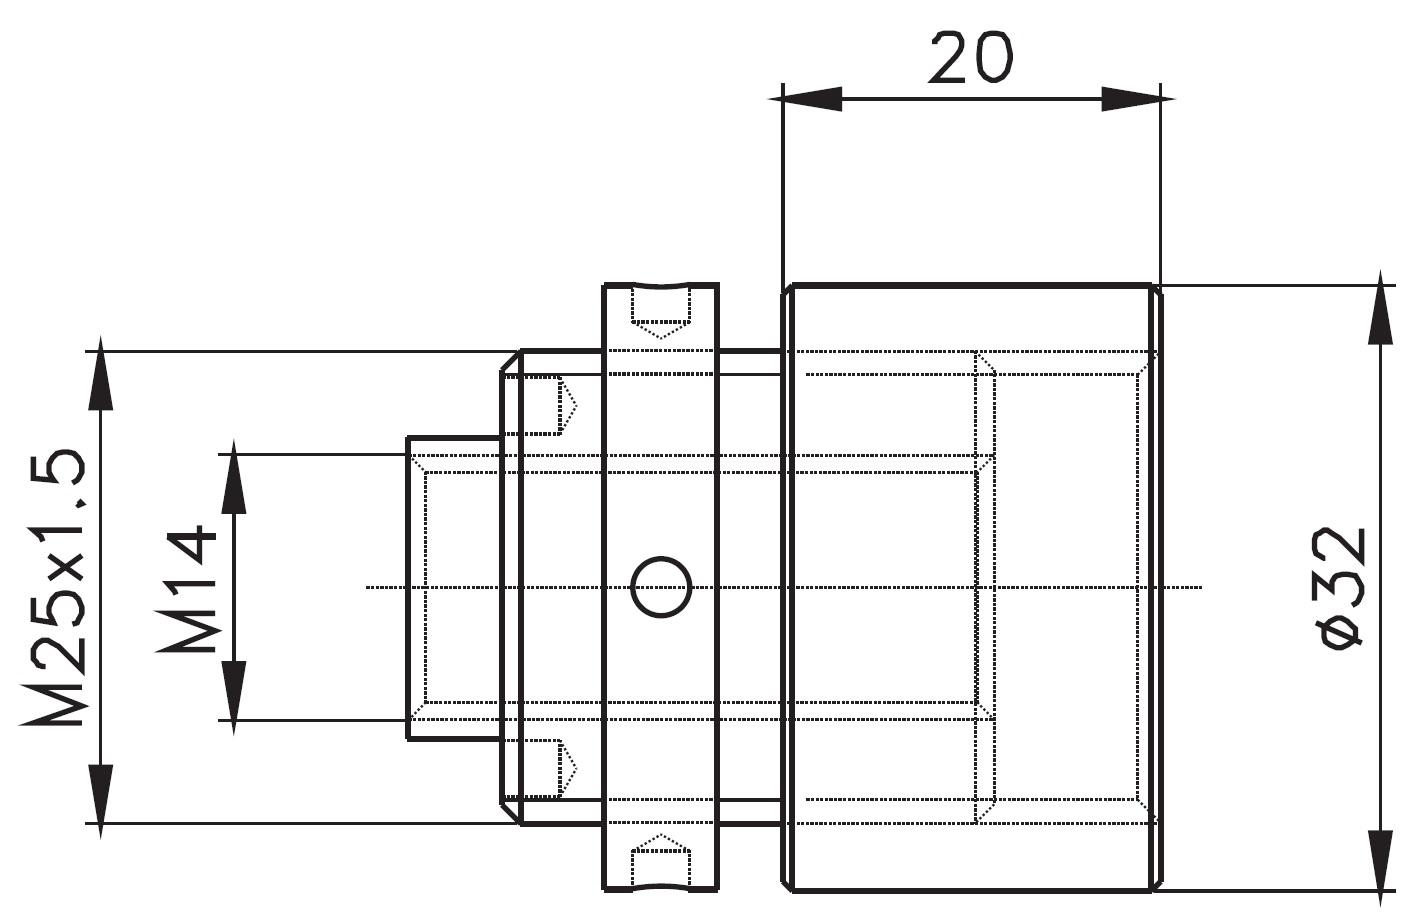 SK-32x20 / GLASS SPIDER CONNECTOR 32x20 (10mm ADJUSTABLE) Teknik Çizim